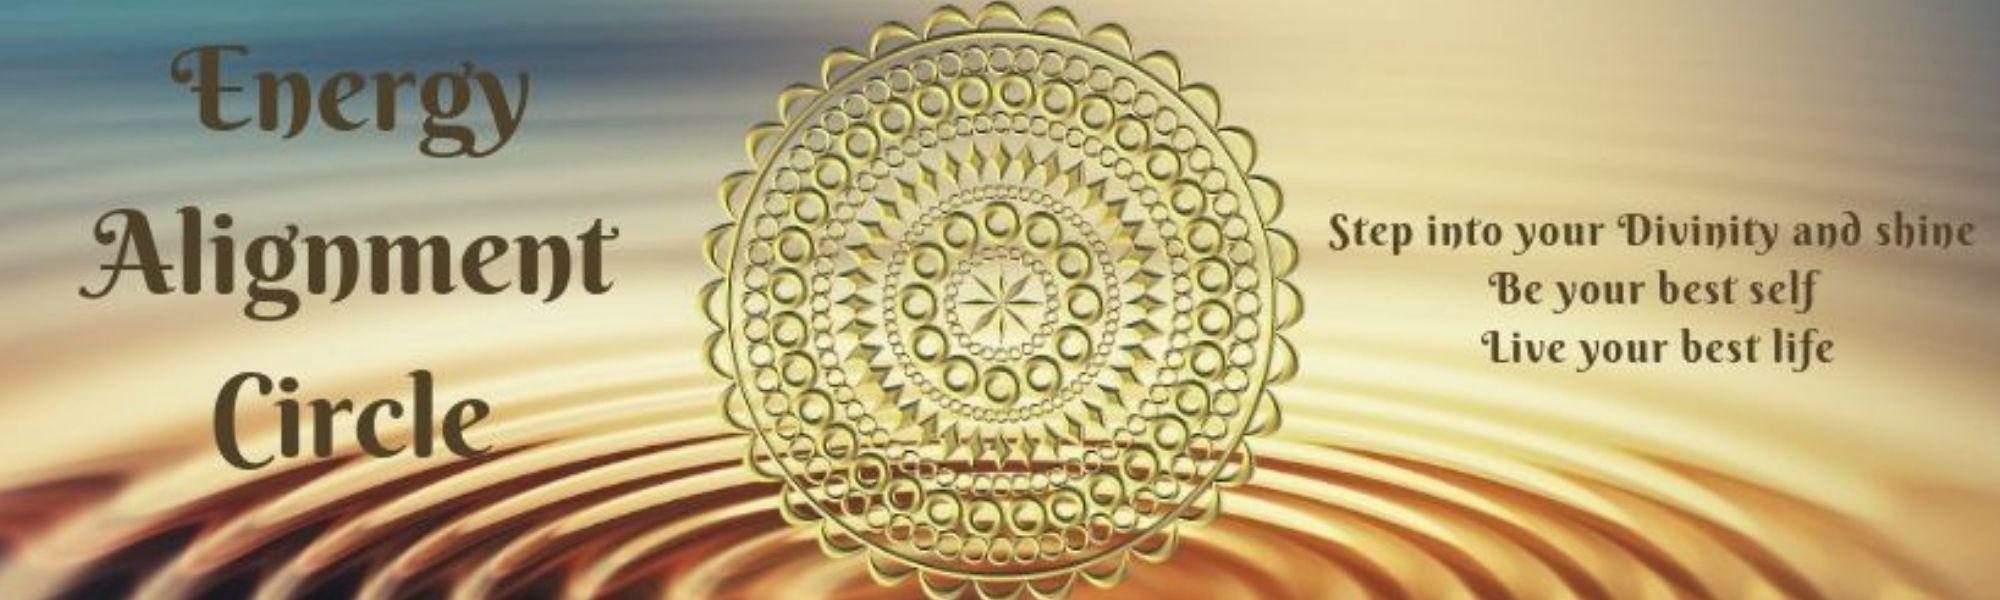 Energy Alignment Circle